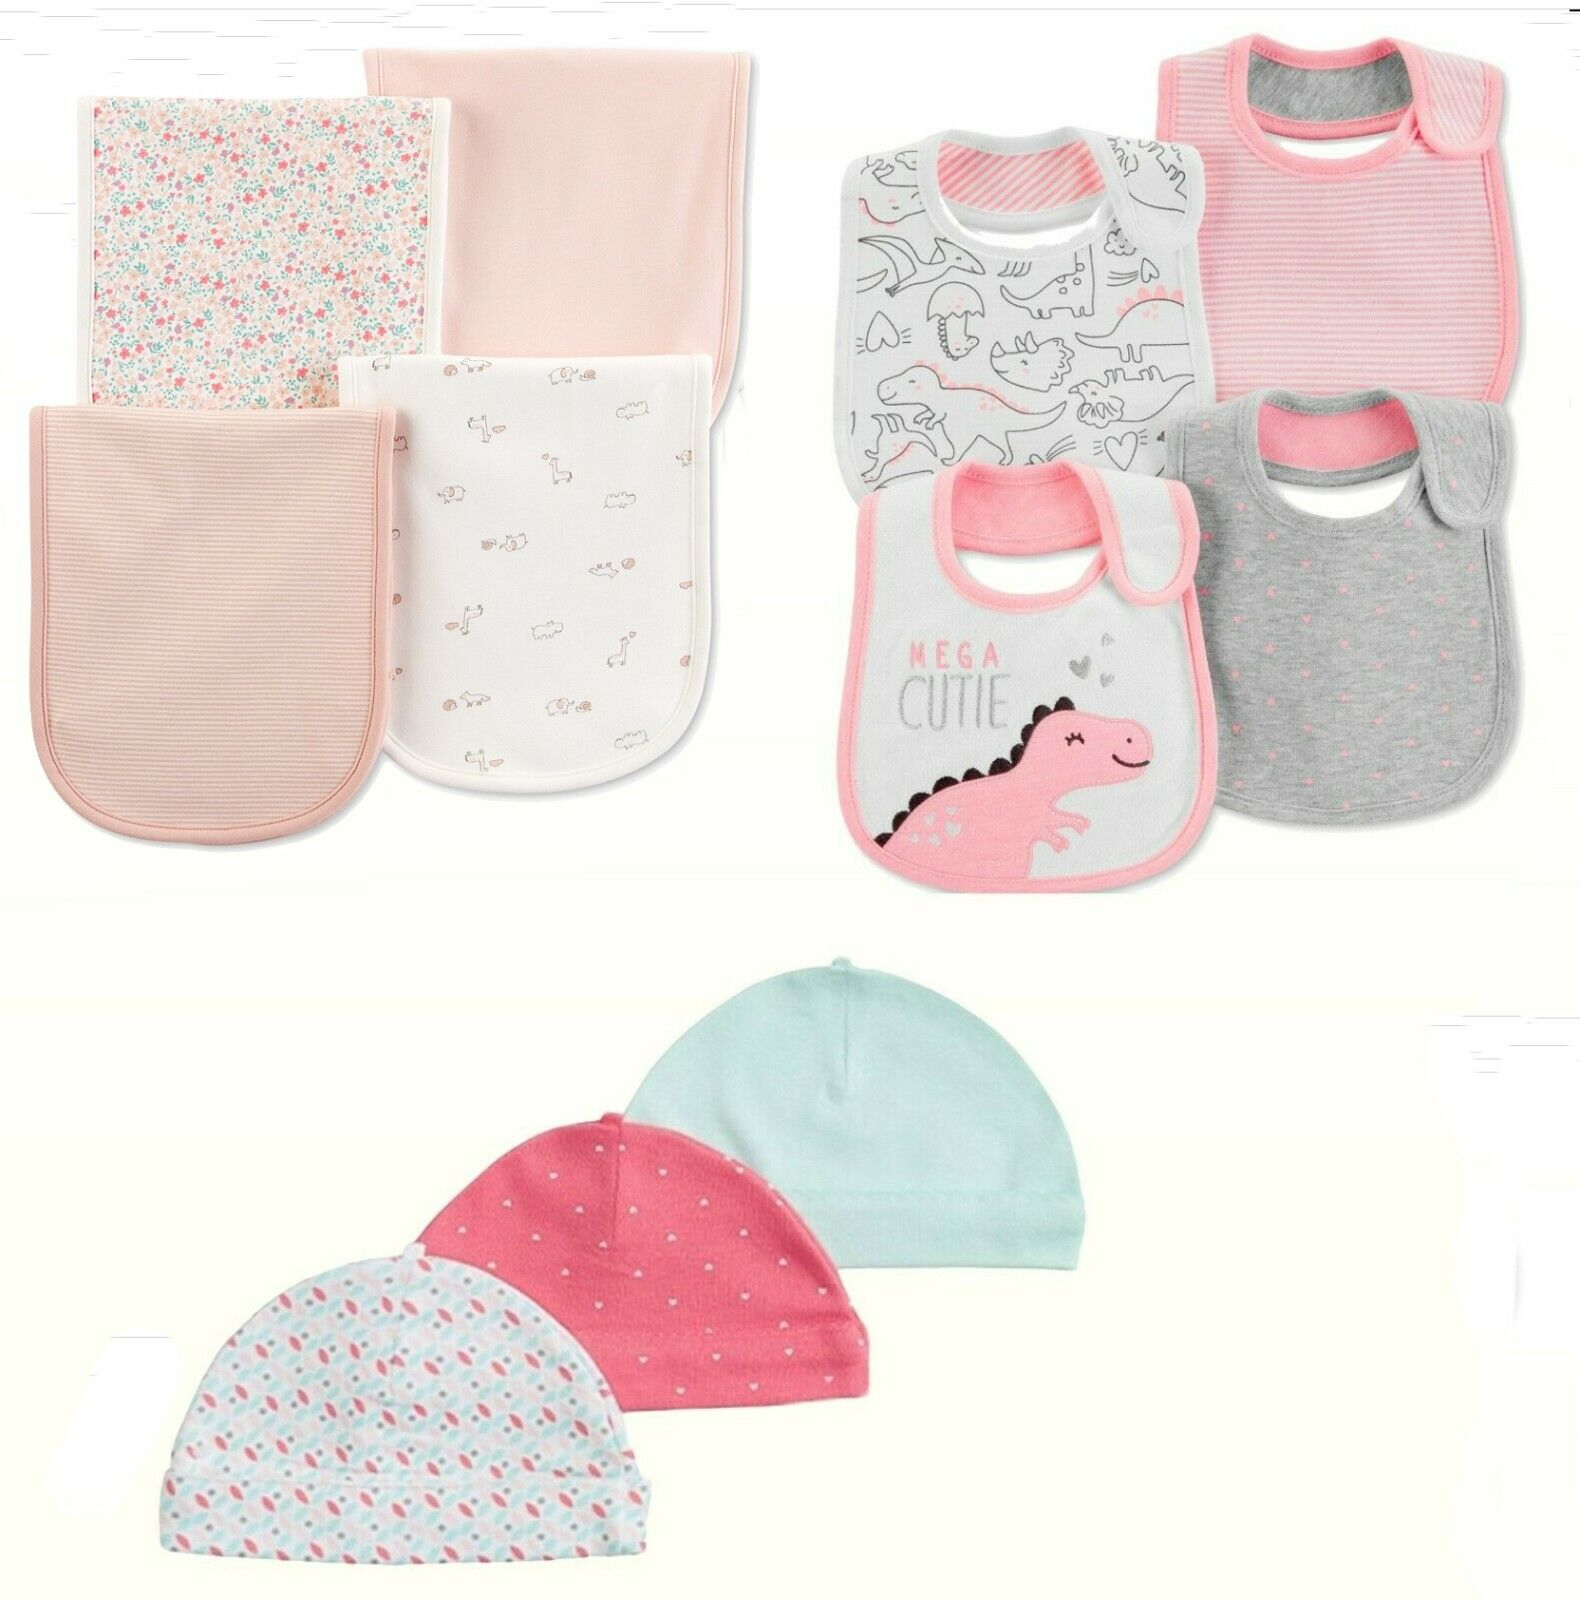 NWT Carter's Baby Girl 4 Pk Burp Cloths ,Bibs or 3 Pk Hats L